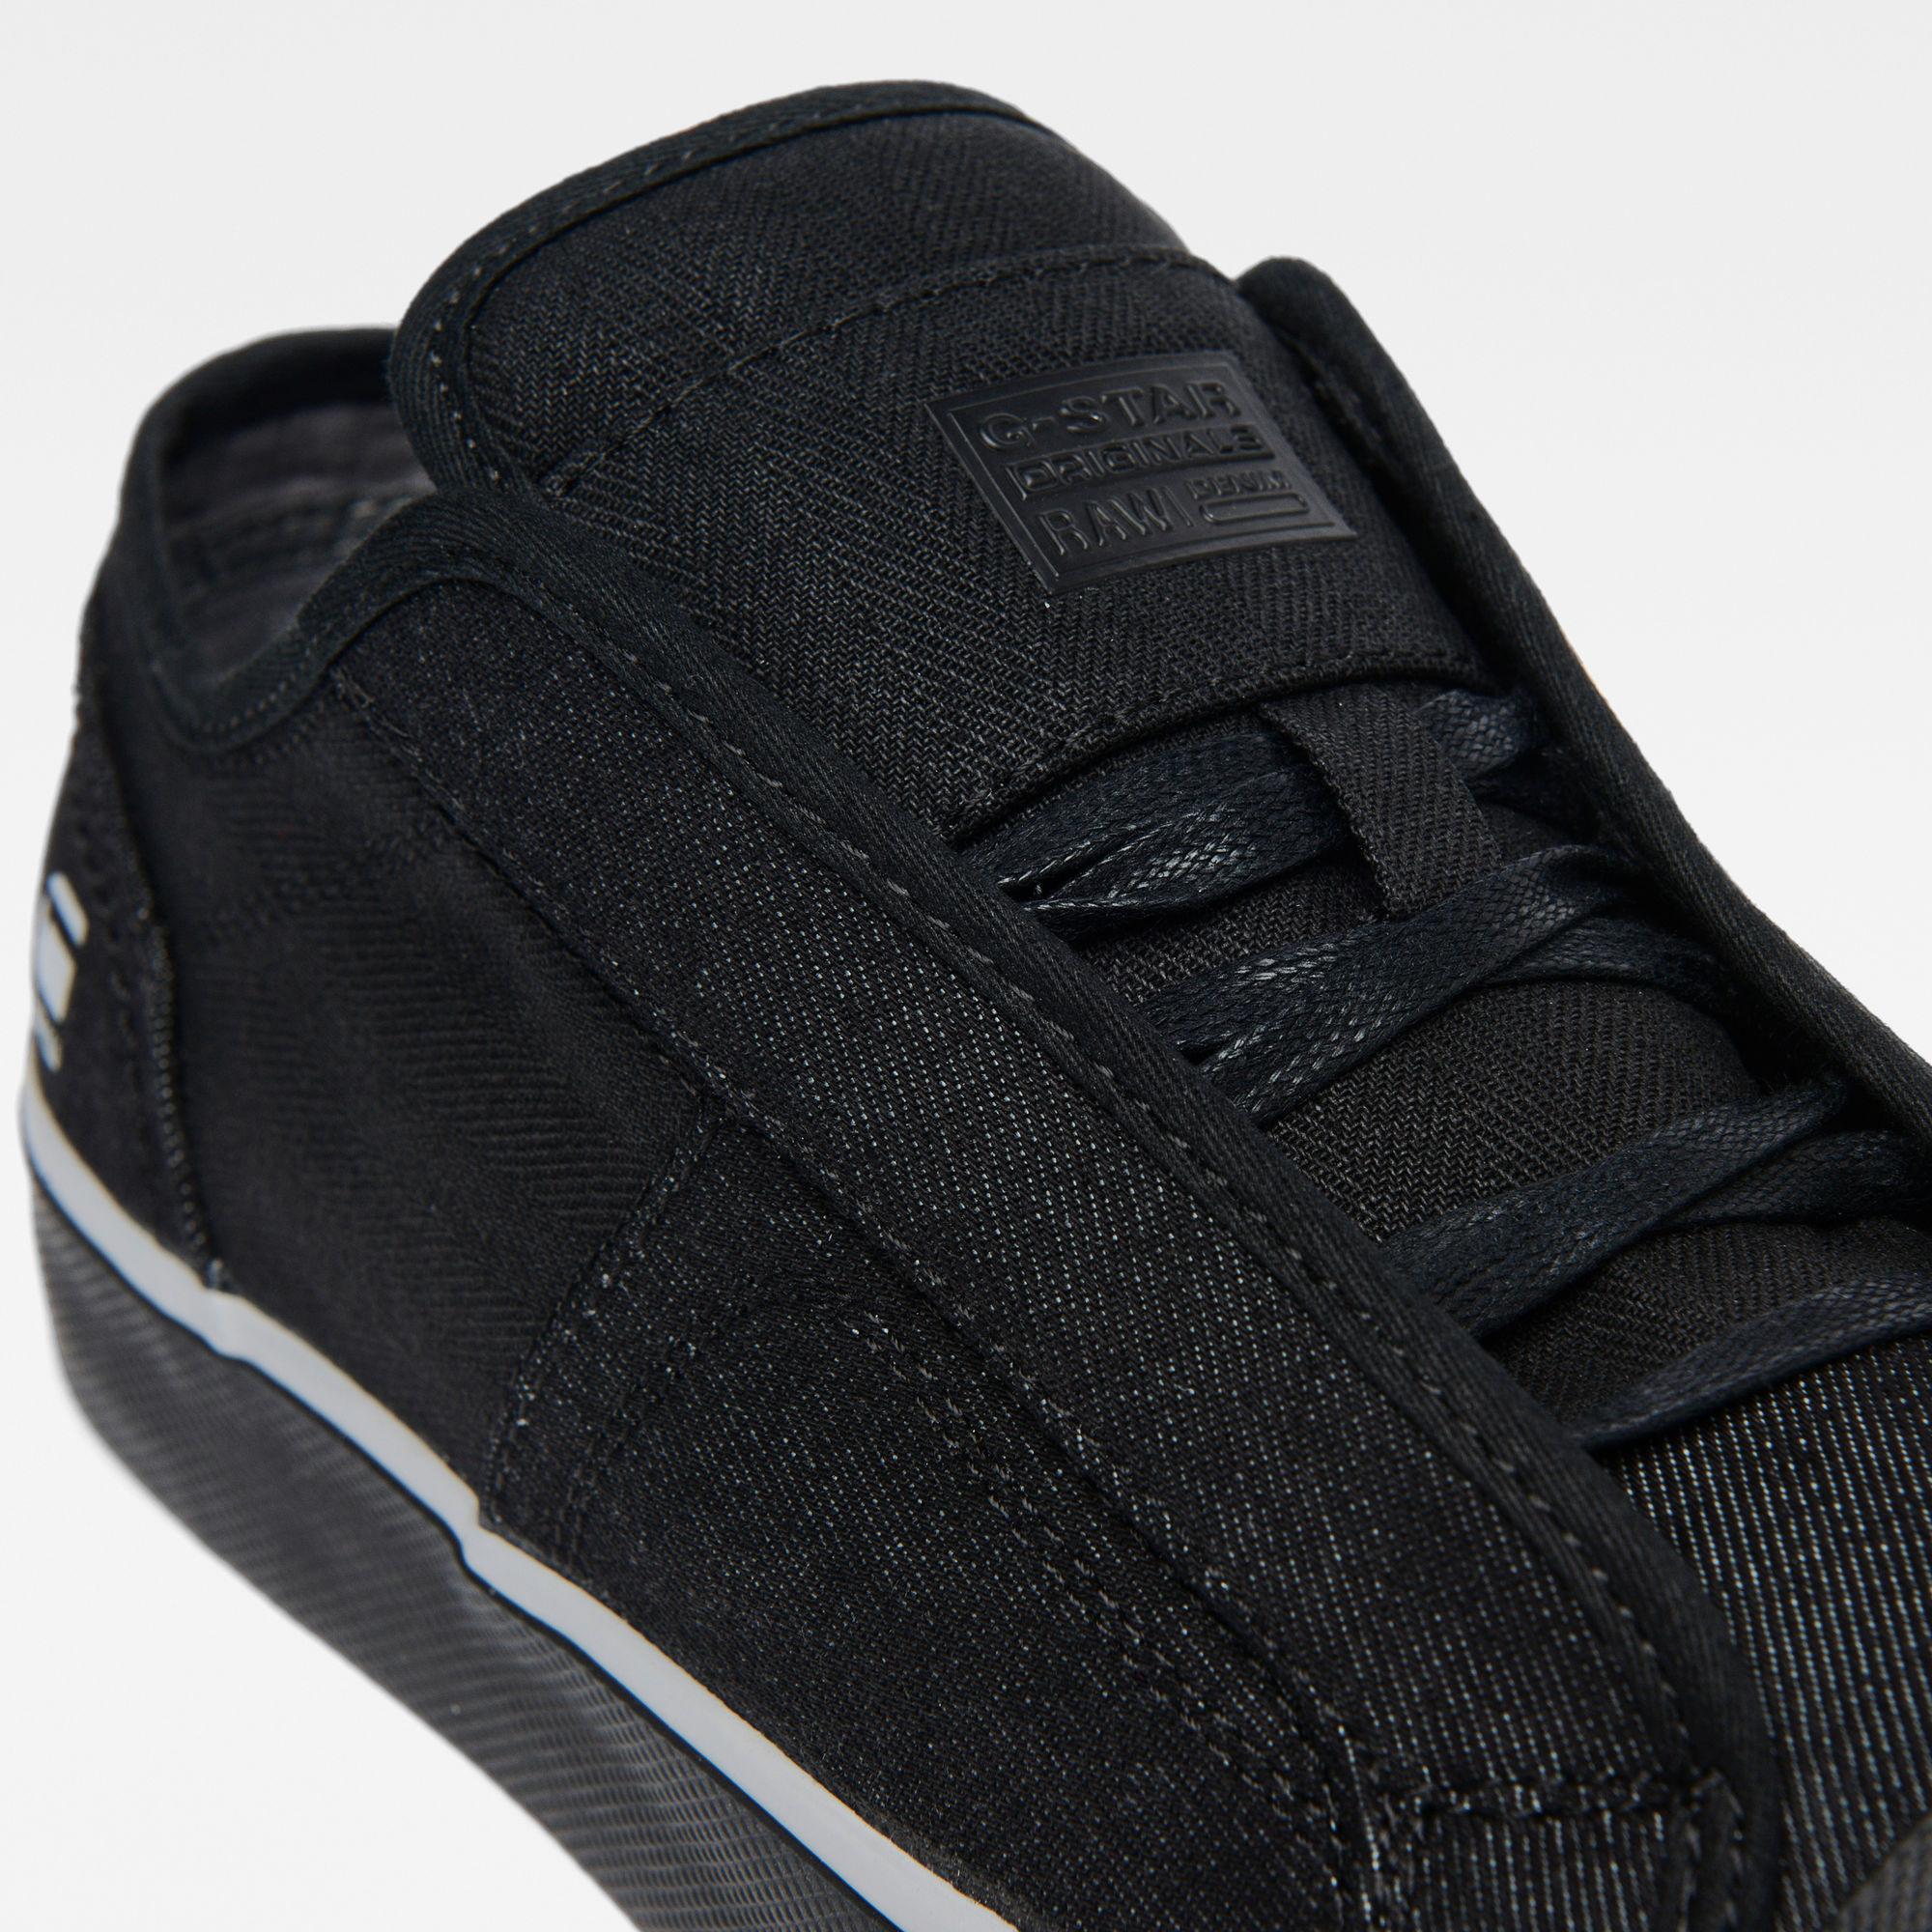 Details zu G Star RAW Neu Herren Scuba Low Sneakers